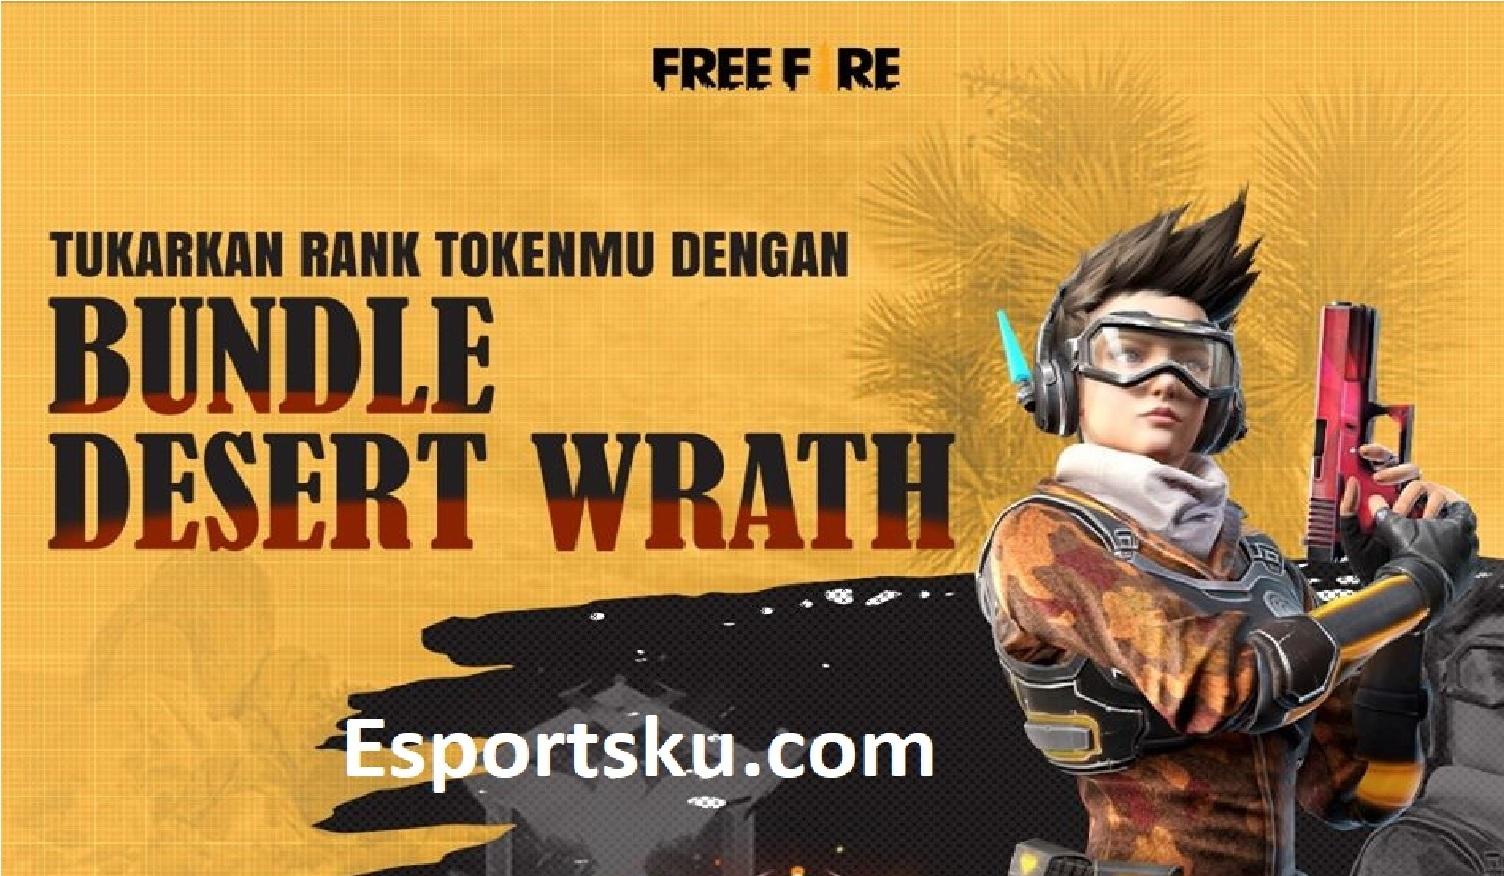 6 Cara Cheat Free Fire Ff Terbaru Work 2021 Esportsku